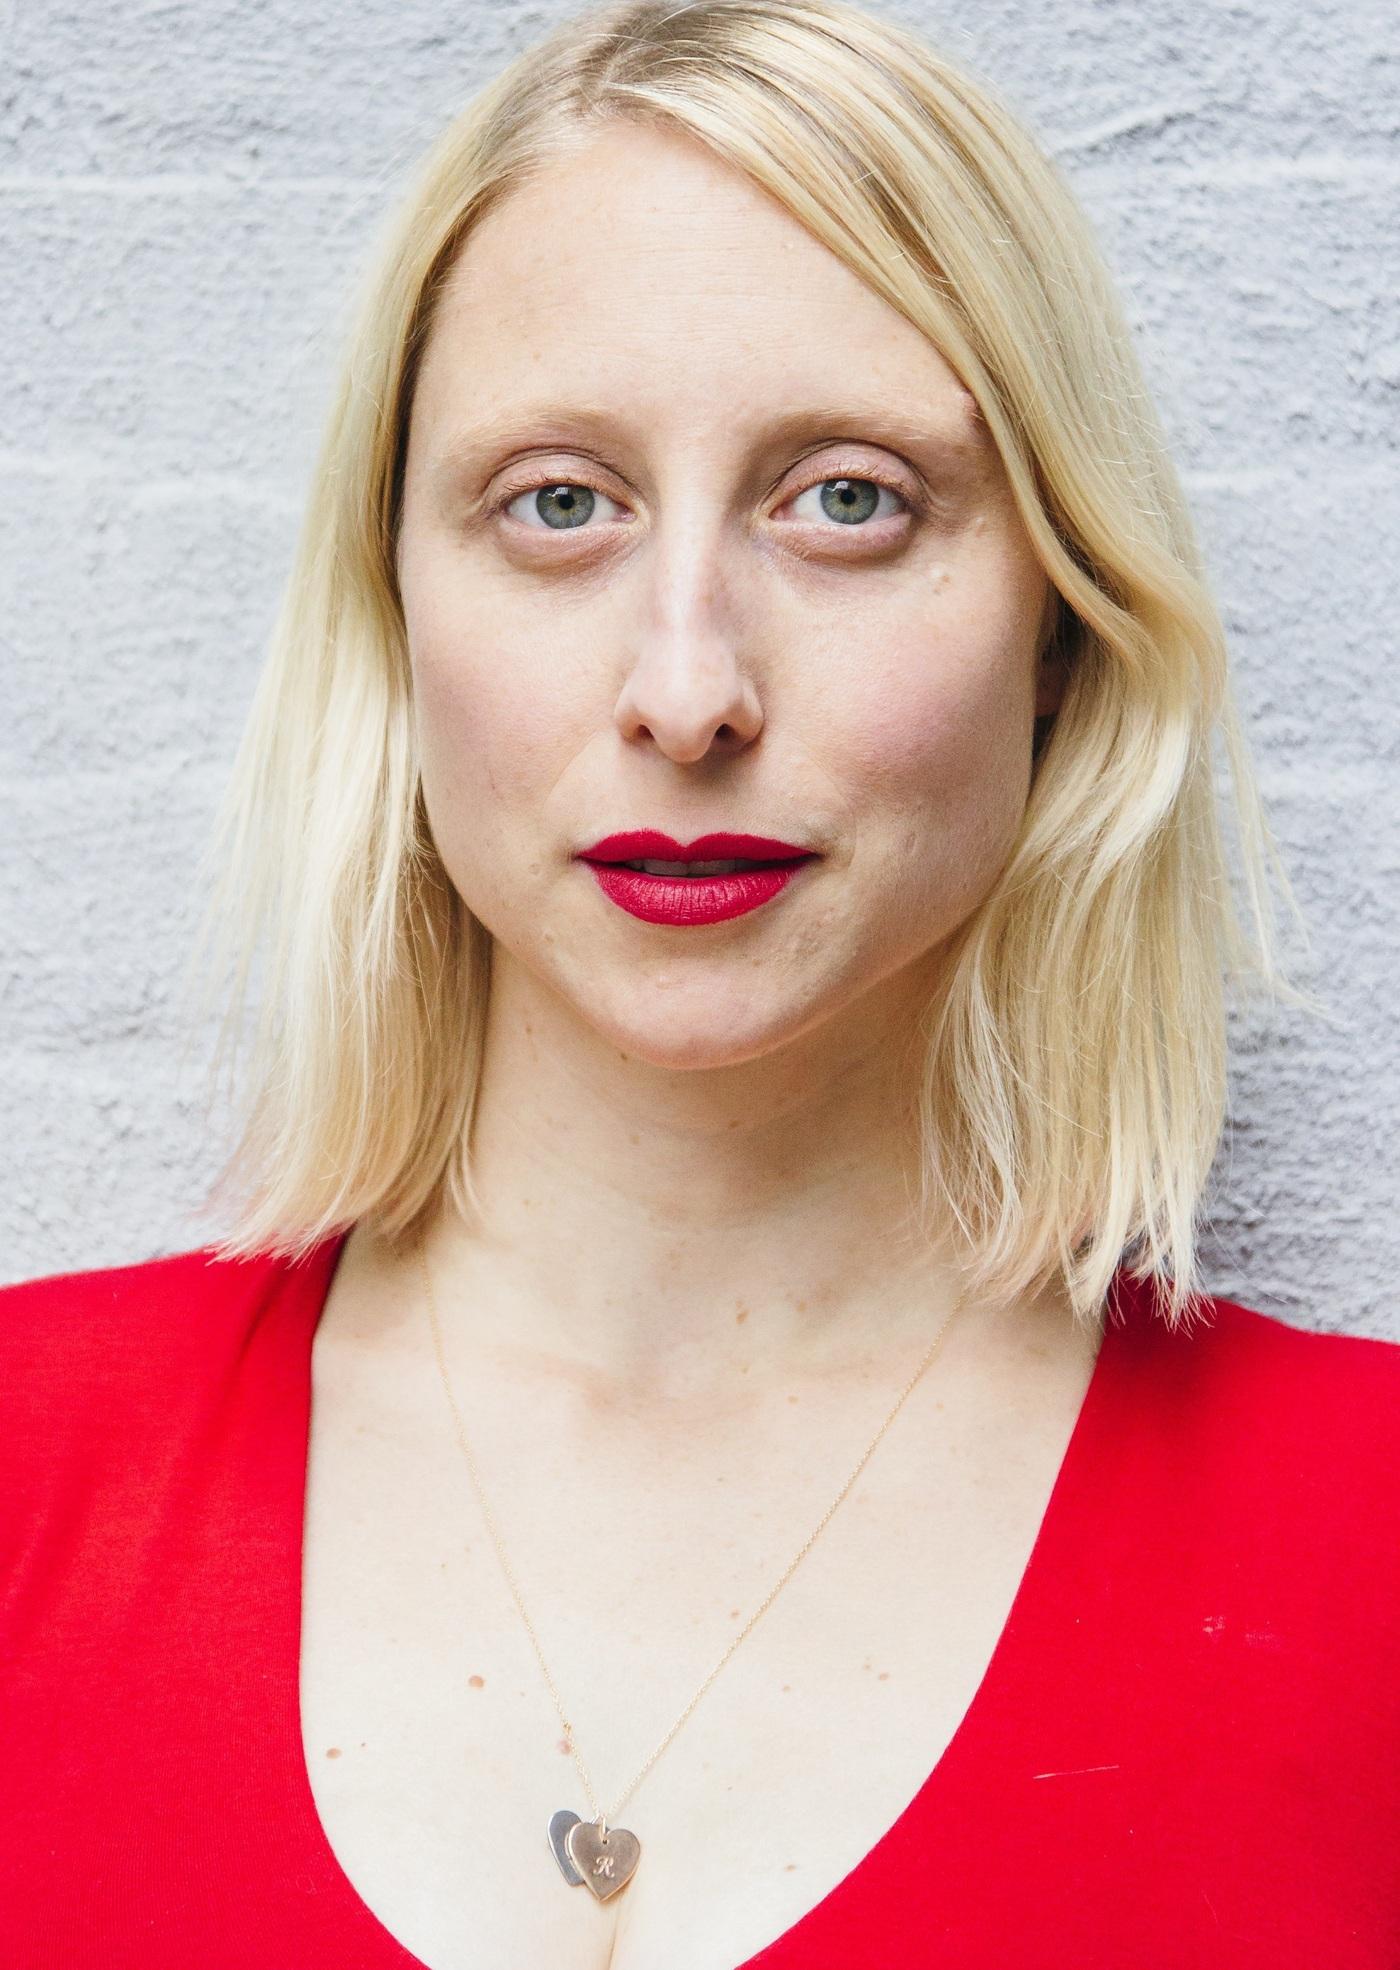 Exploring The 'Quiet New York' With Emma Straub : NPR